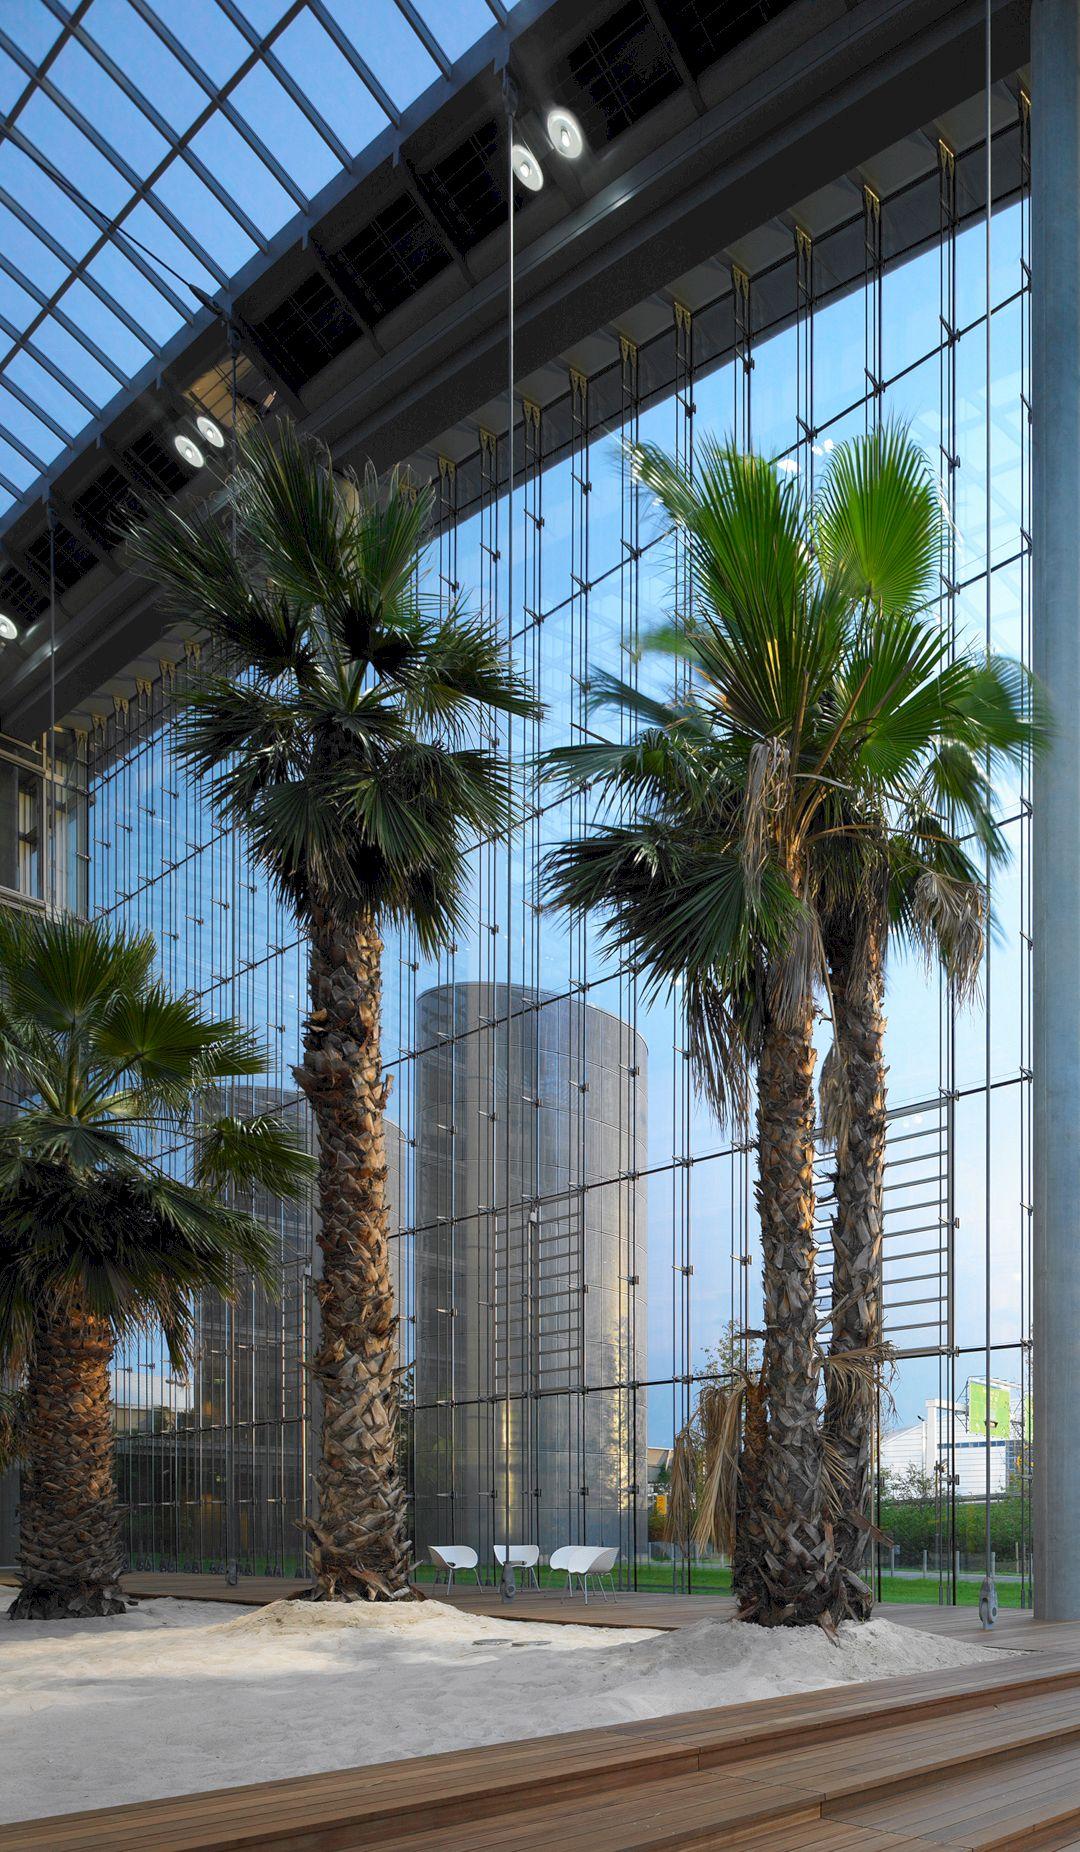 Lufthansa Aviation Center Frankfurt By Ingenhoven Architects 14